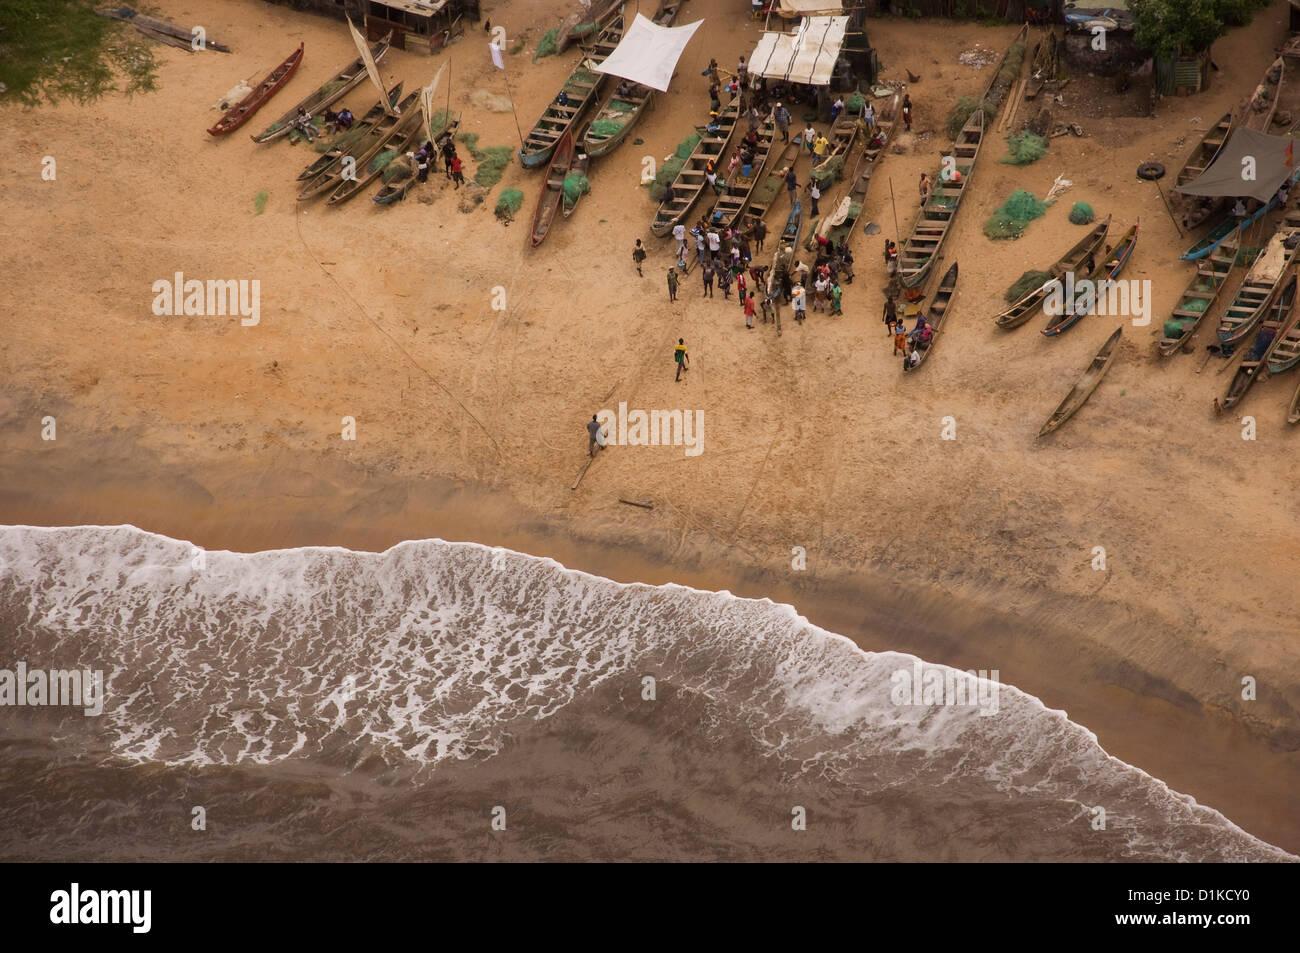 Liberia coastline, a few miles west of Monrovia. - Stock Image